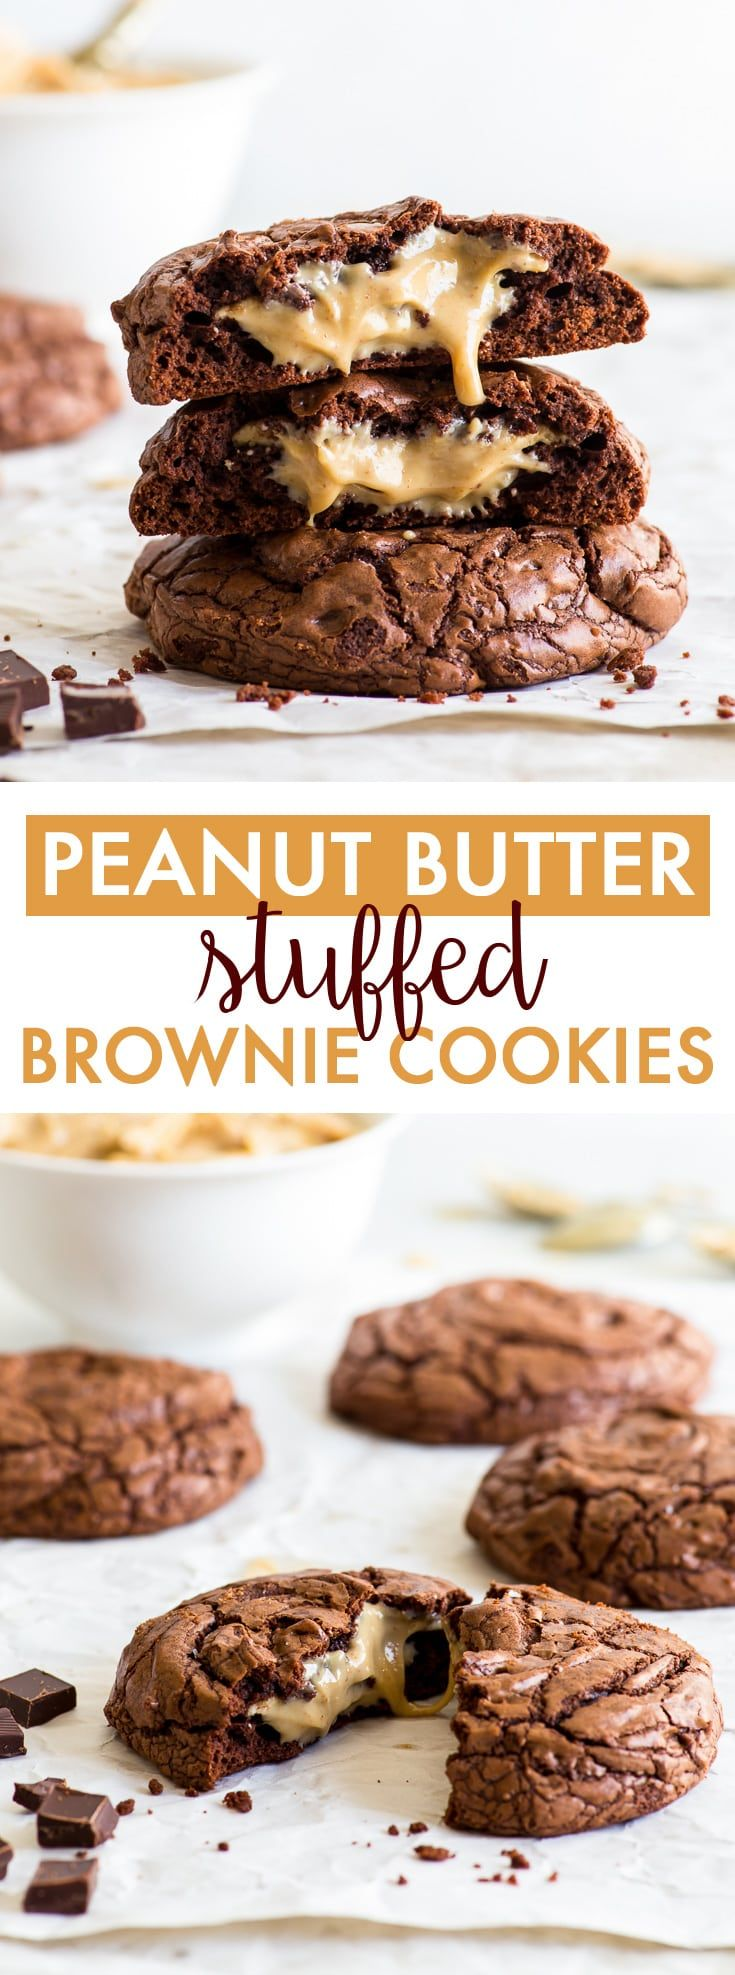 Peanut Butter Stuffed Brownie Cookies (Gluten Free…